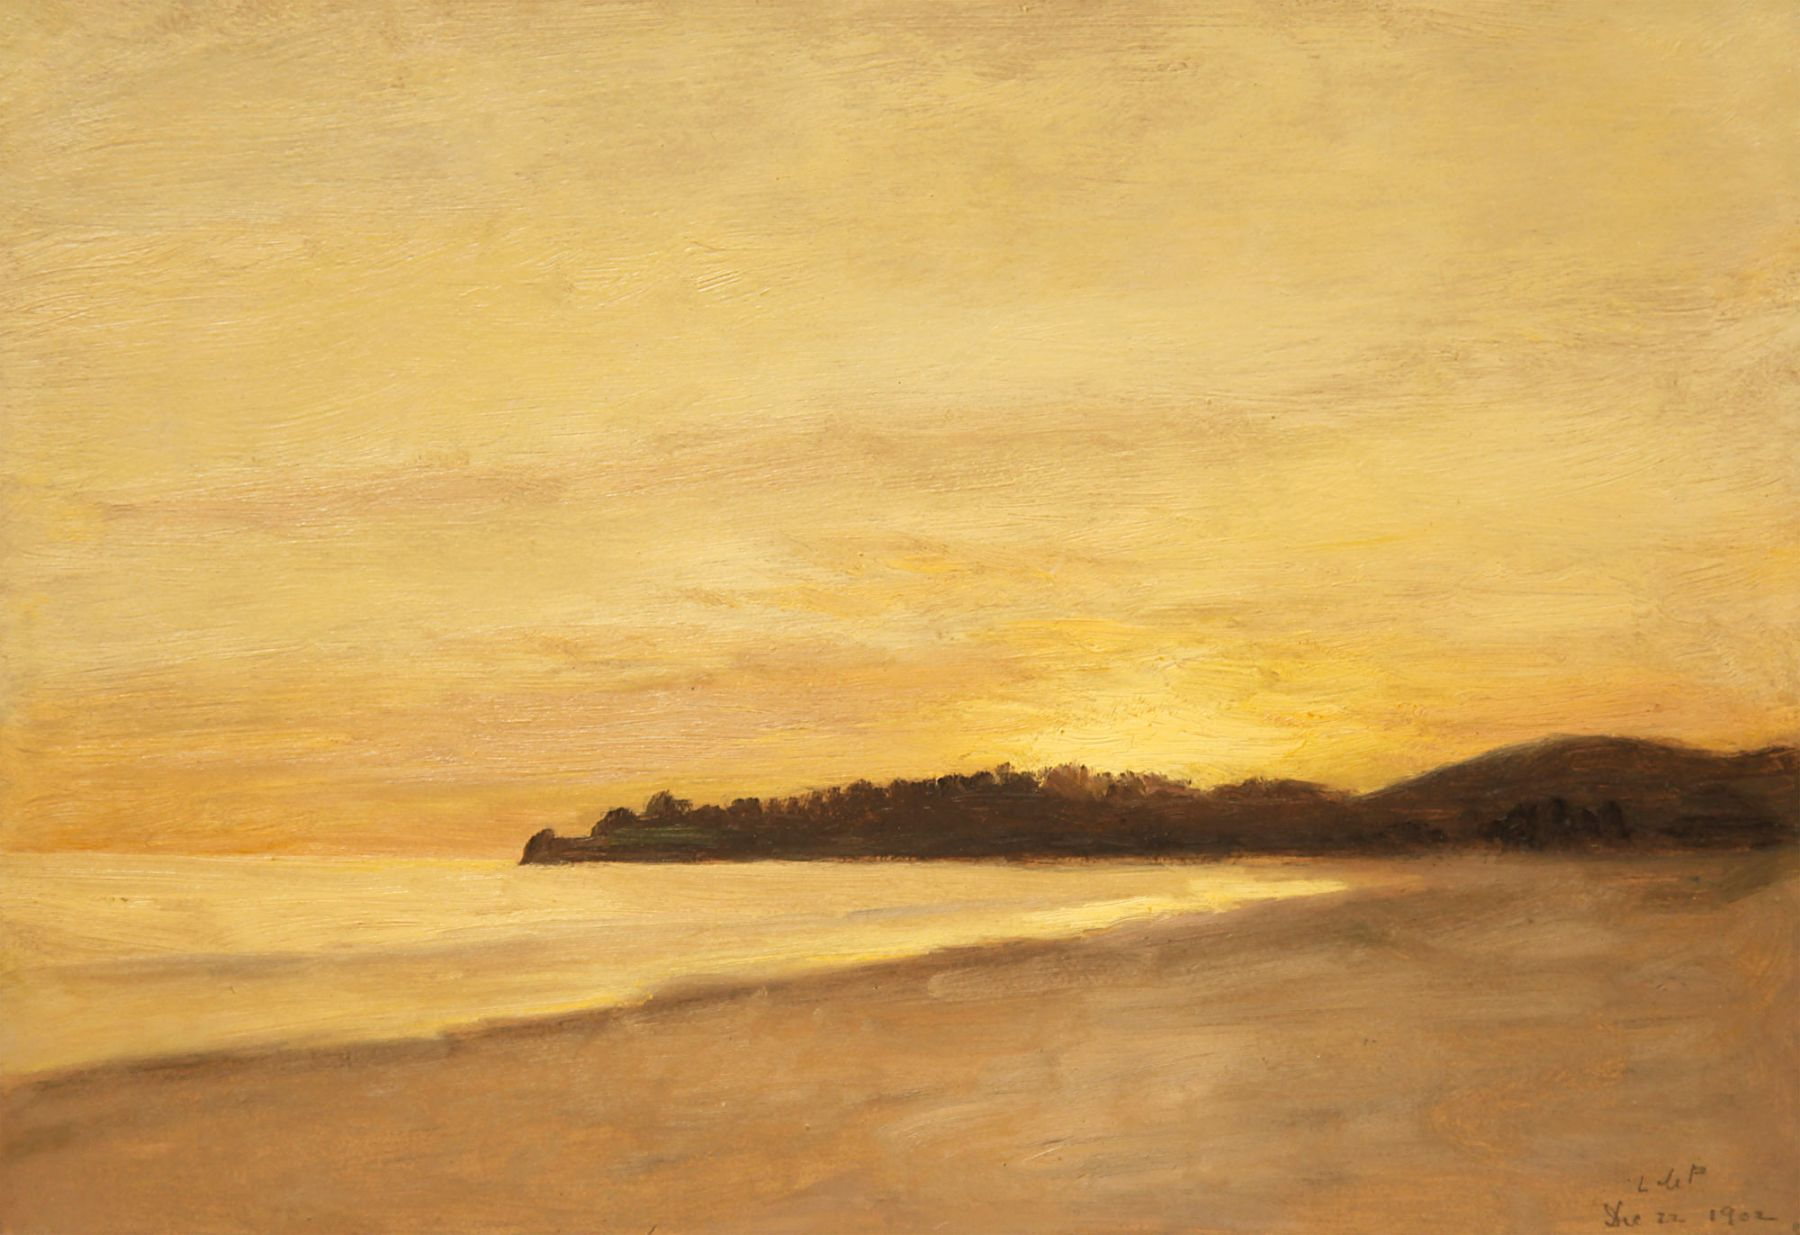 LOCKWOOD DE FOREST (1850-1932), Sunset over the Point - Refugio, North of Santa Barbara, December 22, 1902